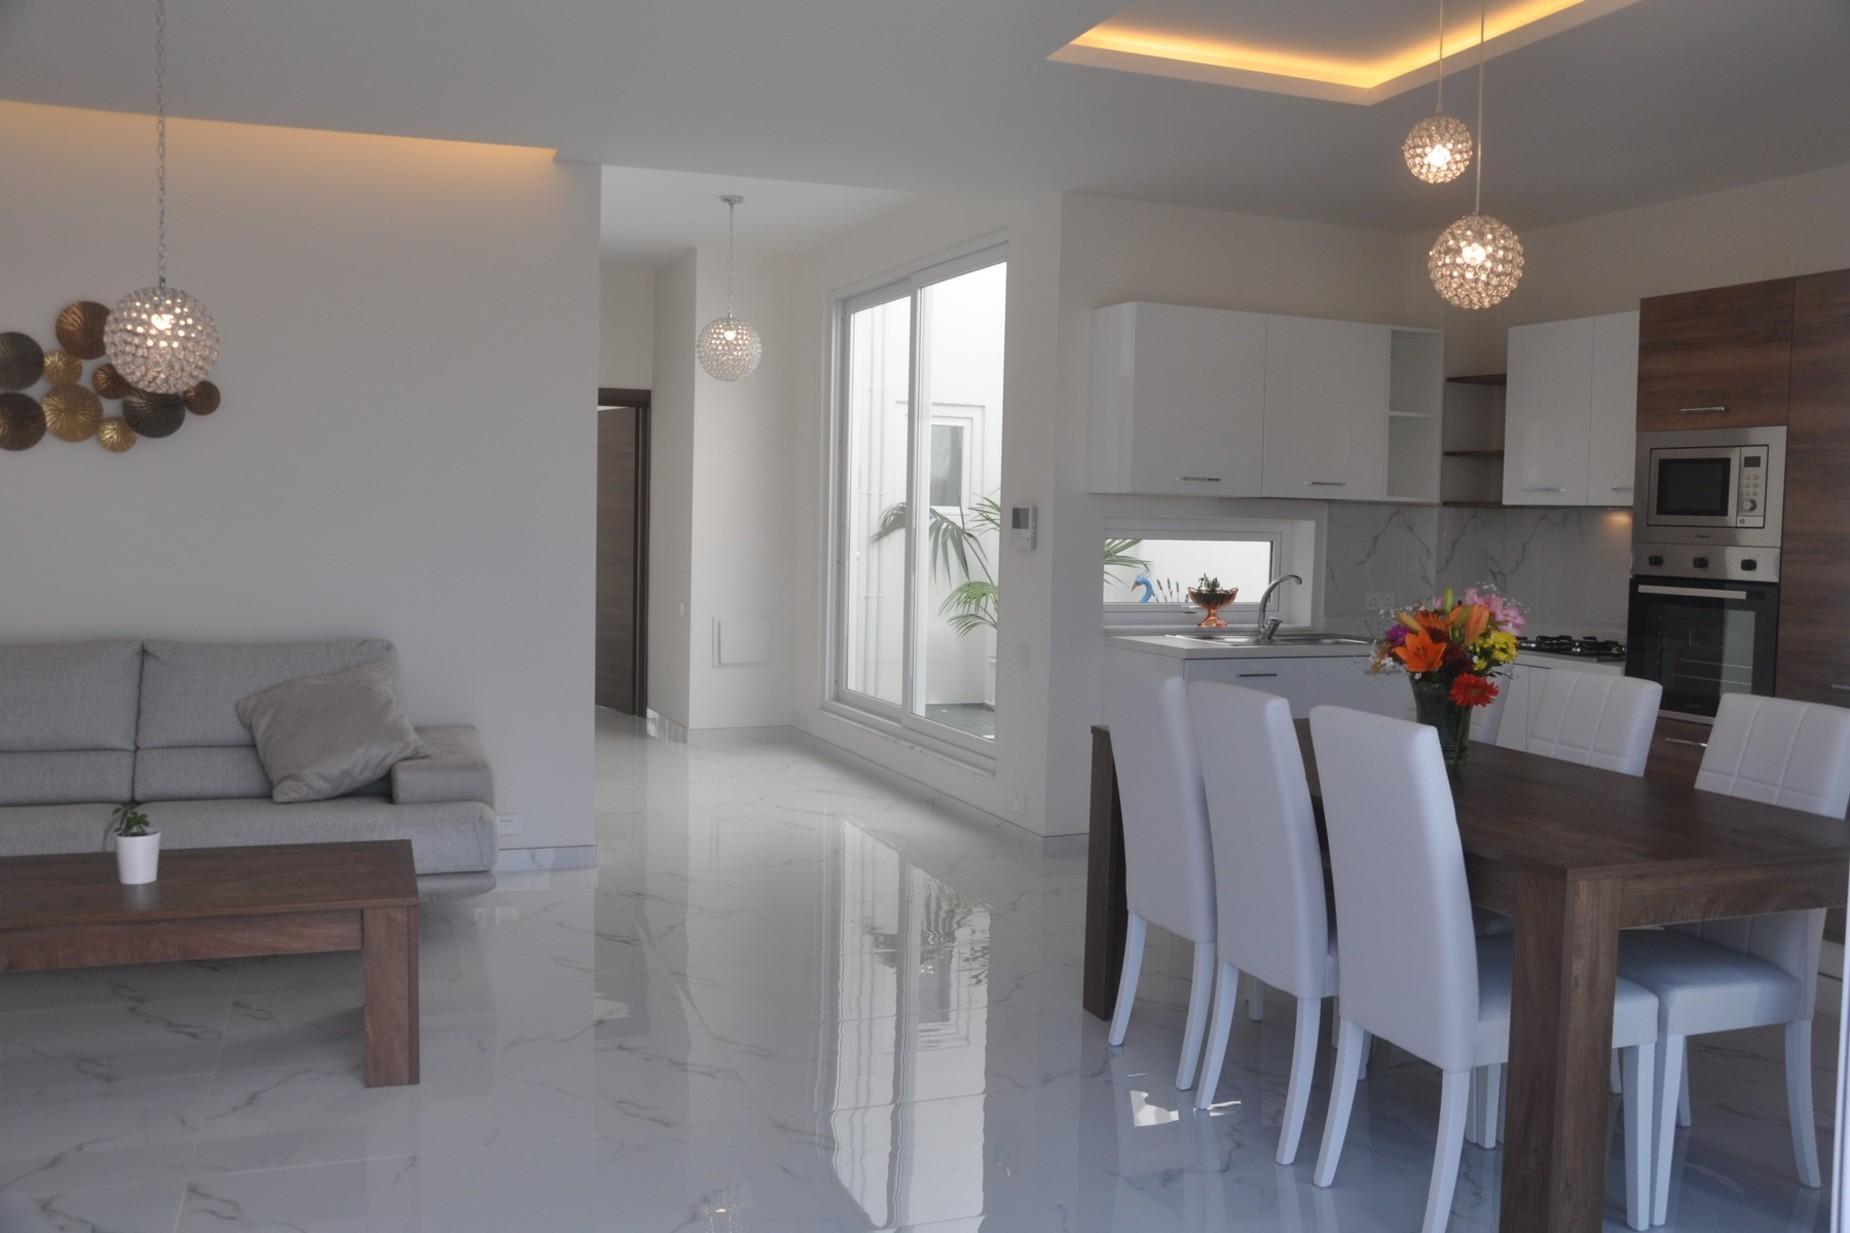 2 bed Penthouse For Sale in Kalkara, Kalkara - thumb 13